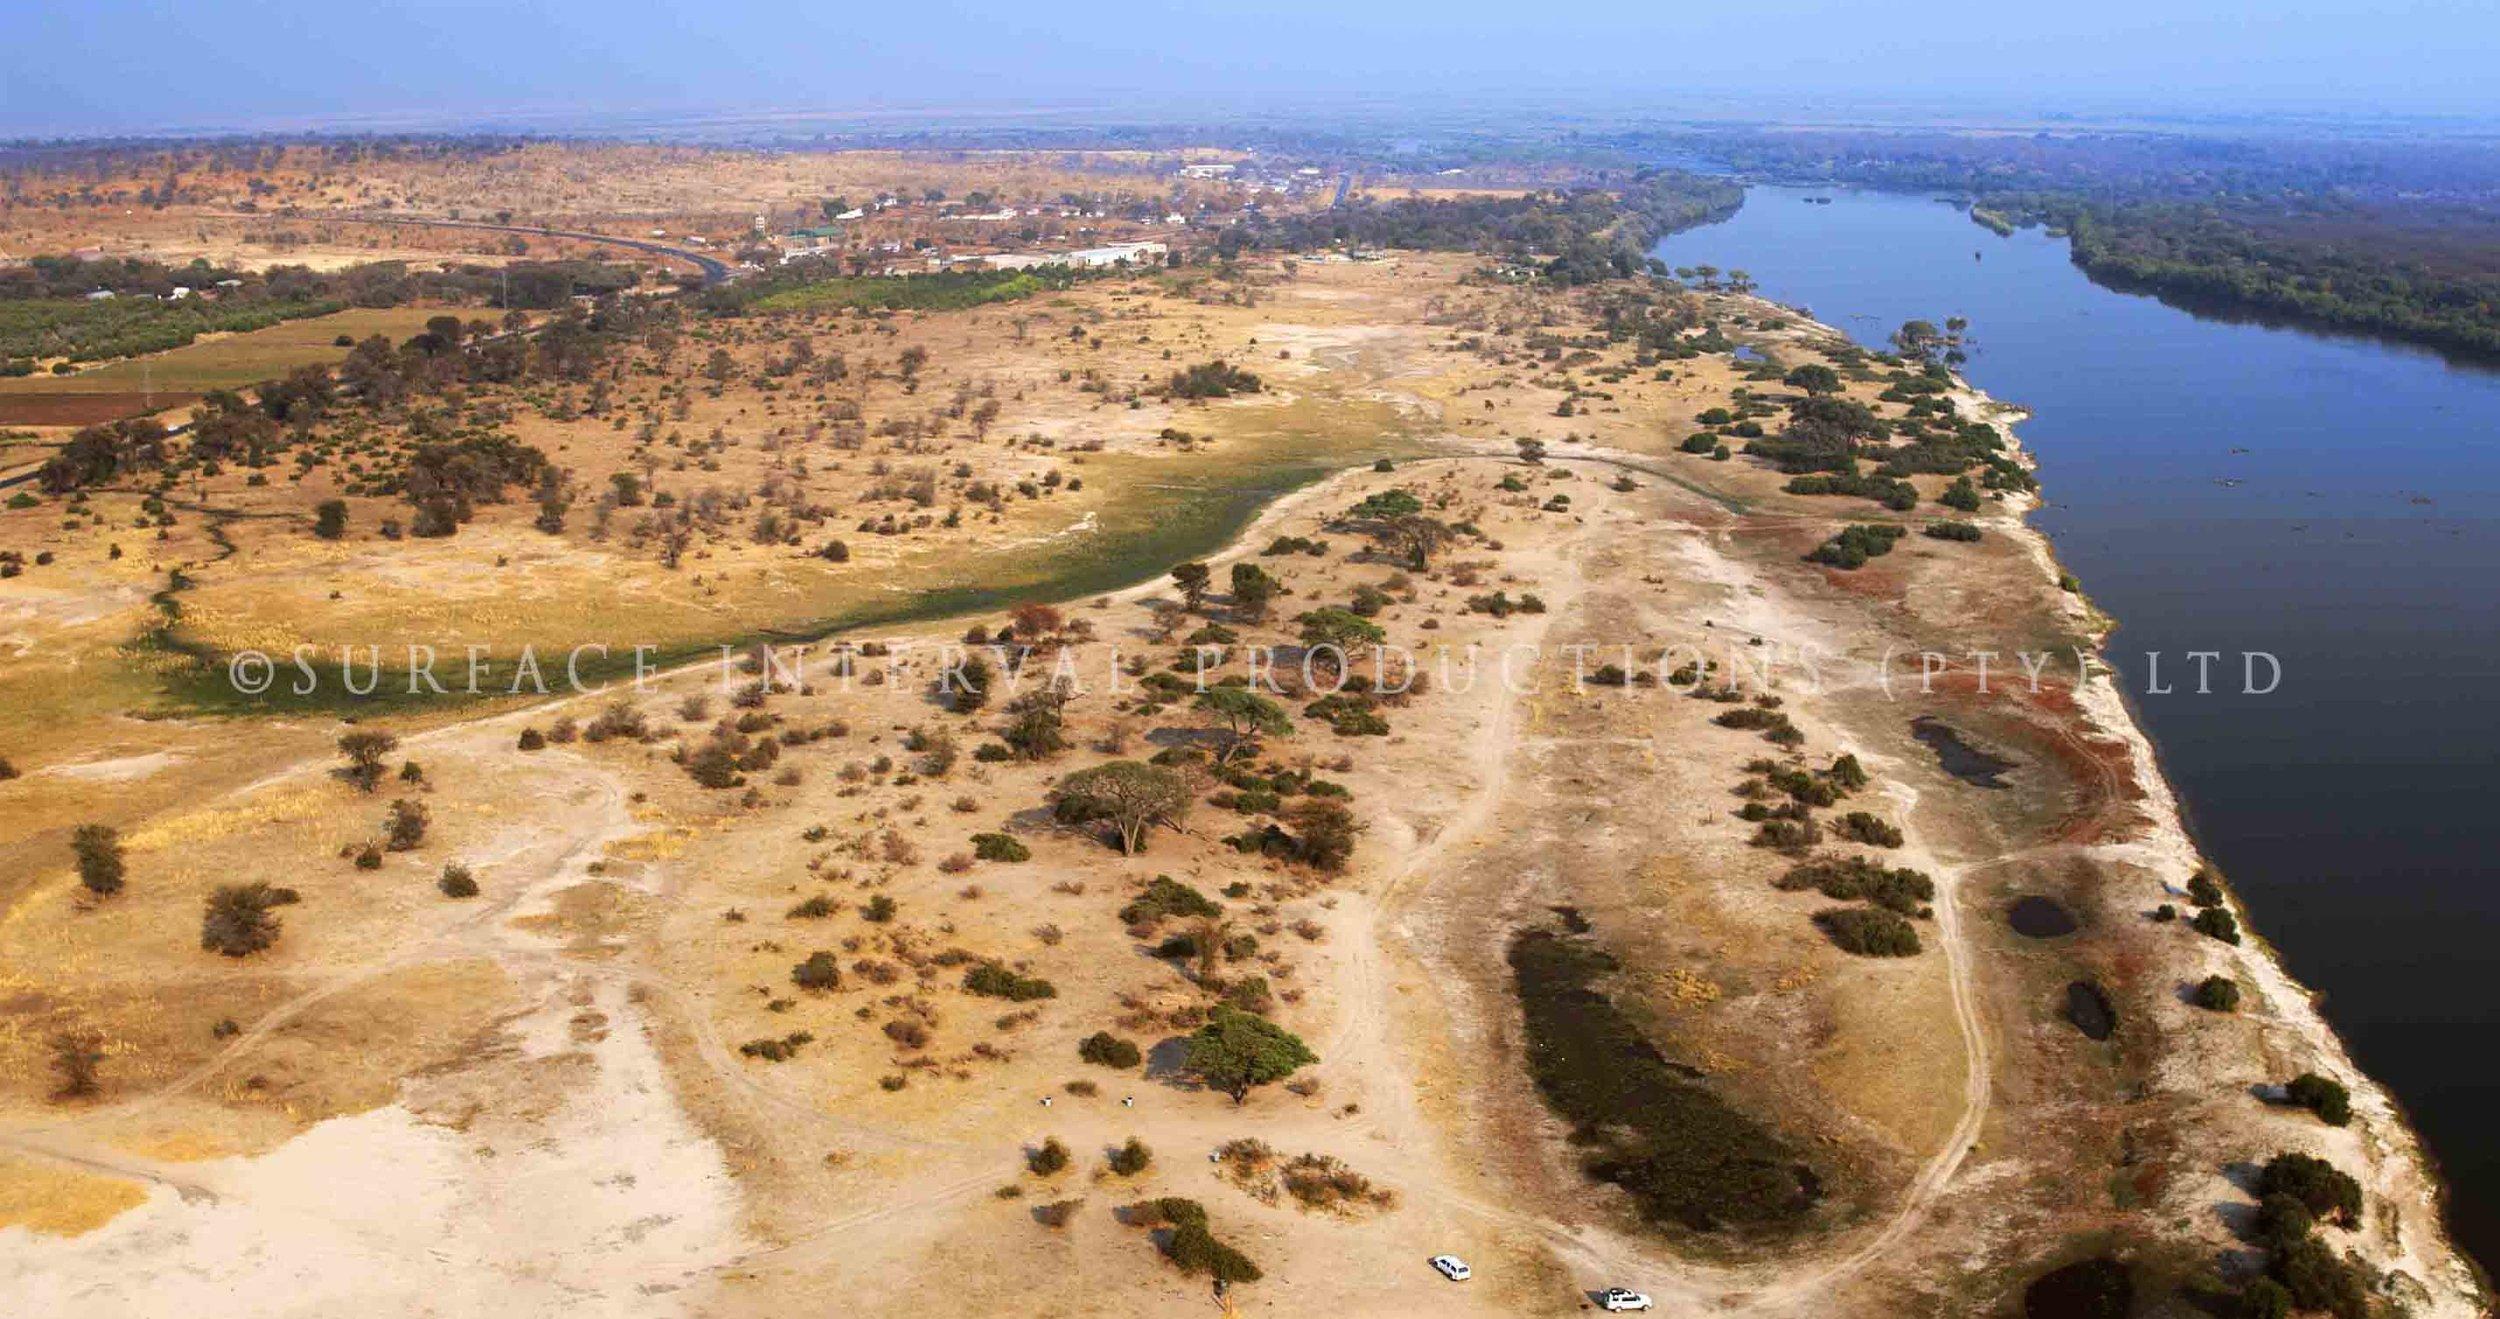 Chobe river 004ss.jpg